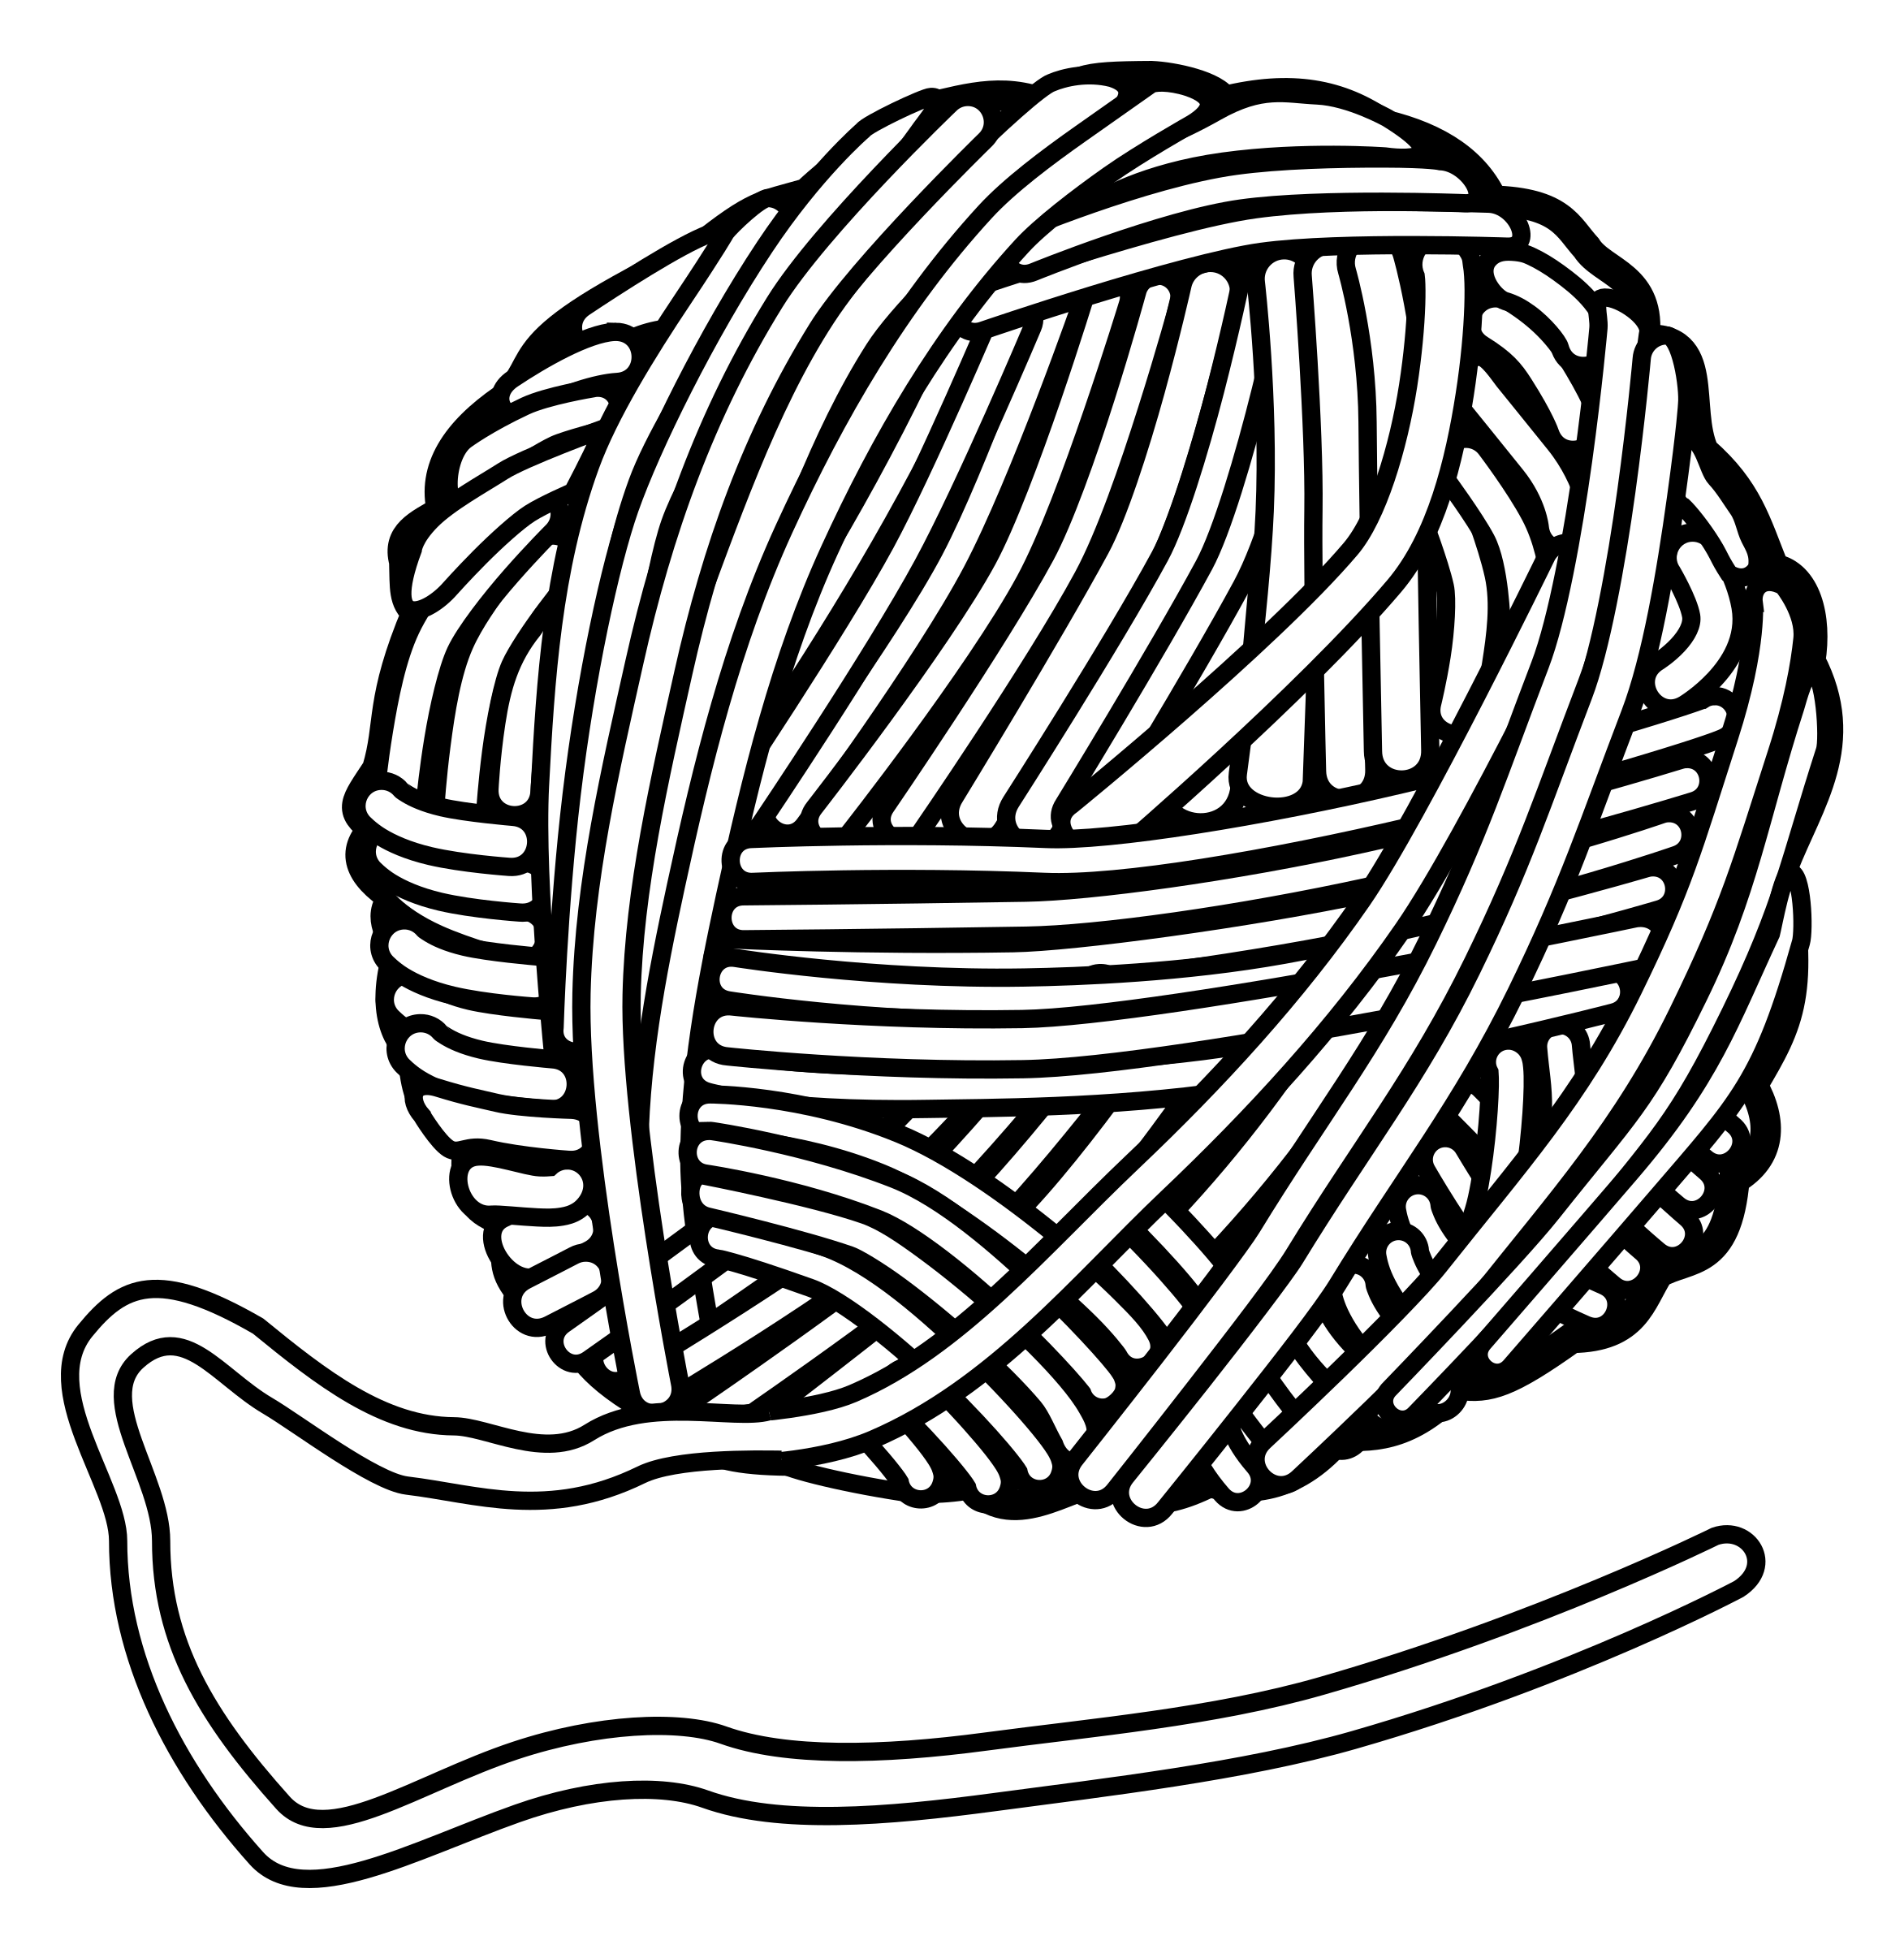 2345x2400 Clipart Yarn And Knitting Needles